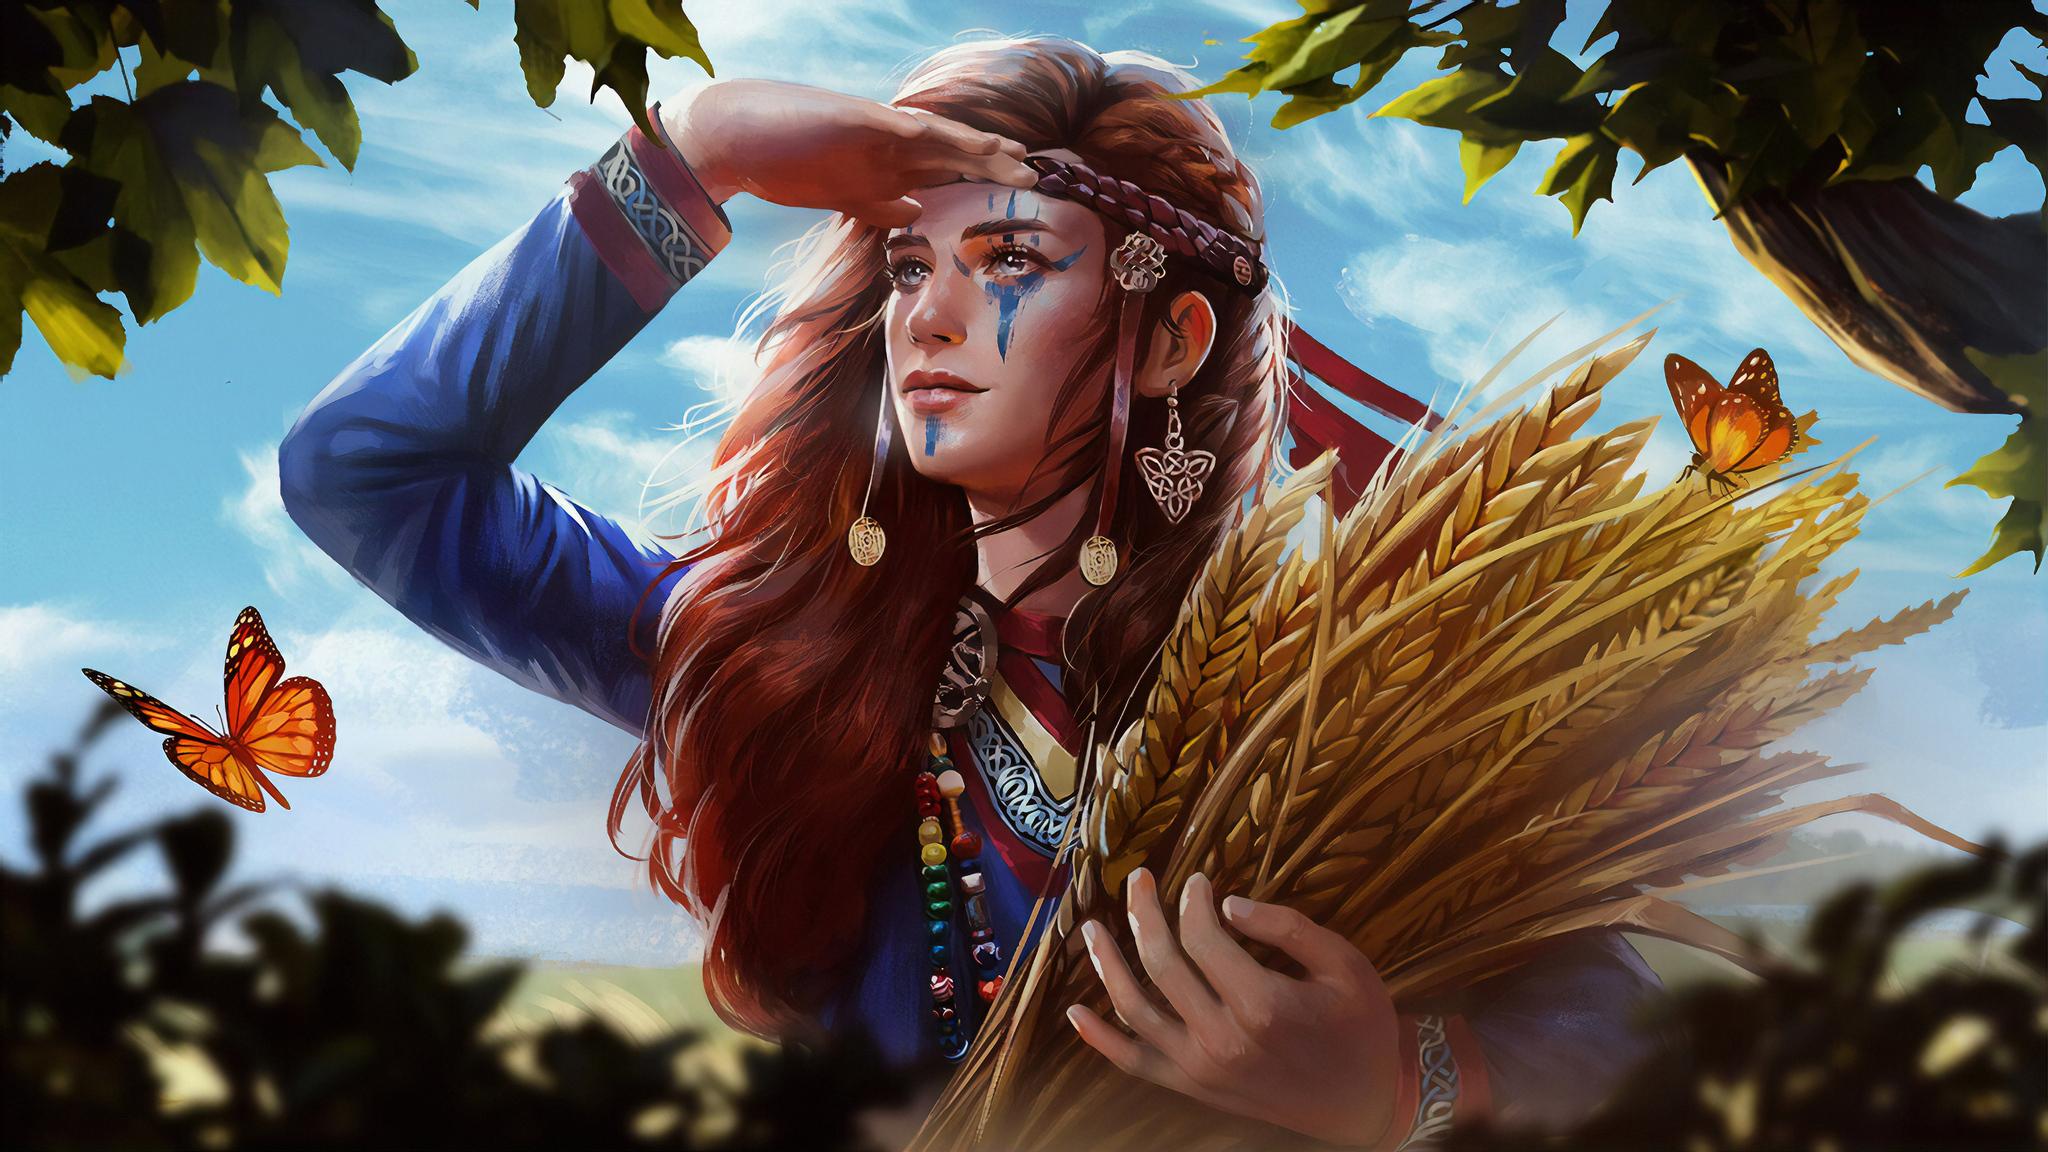 2048x1152 Viking Girl 4k Art 2048x1152 Resolution Hd 4k